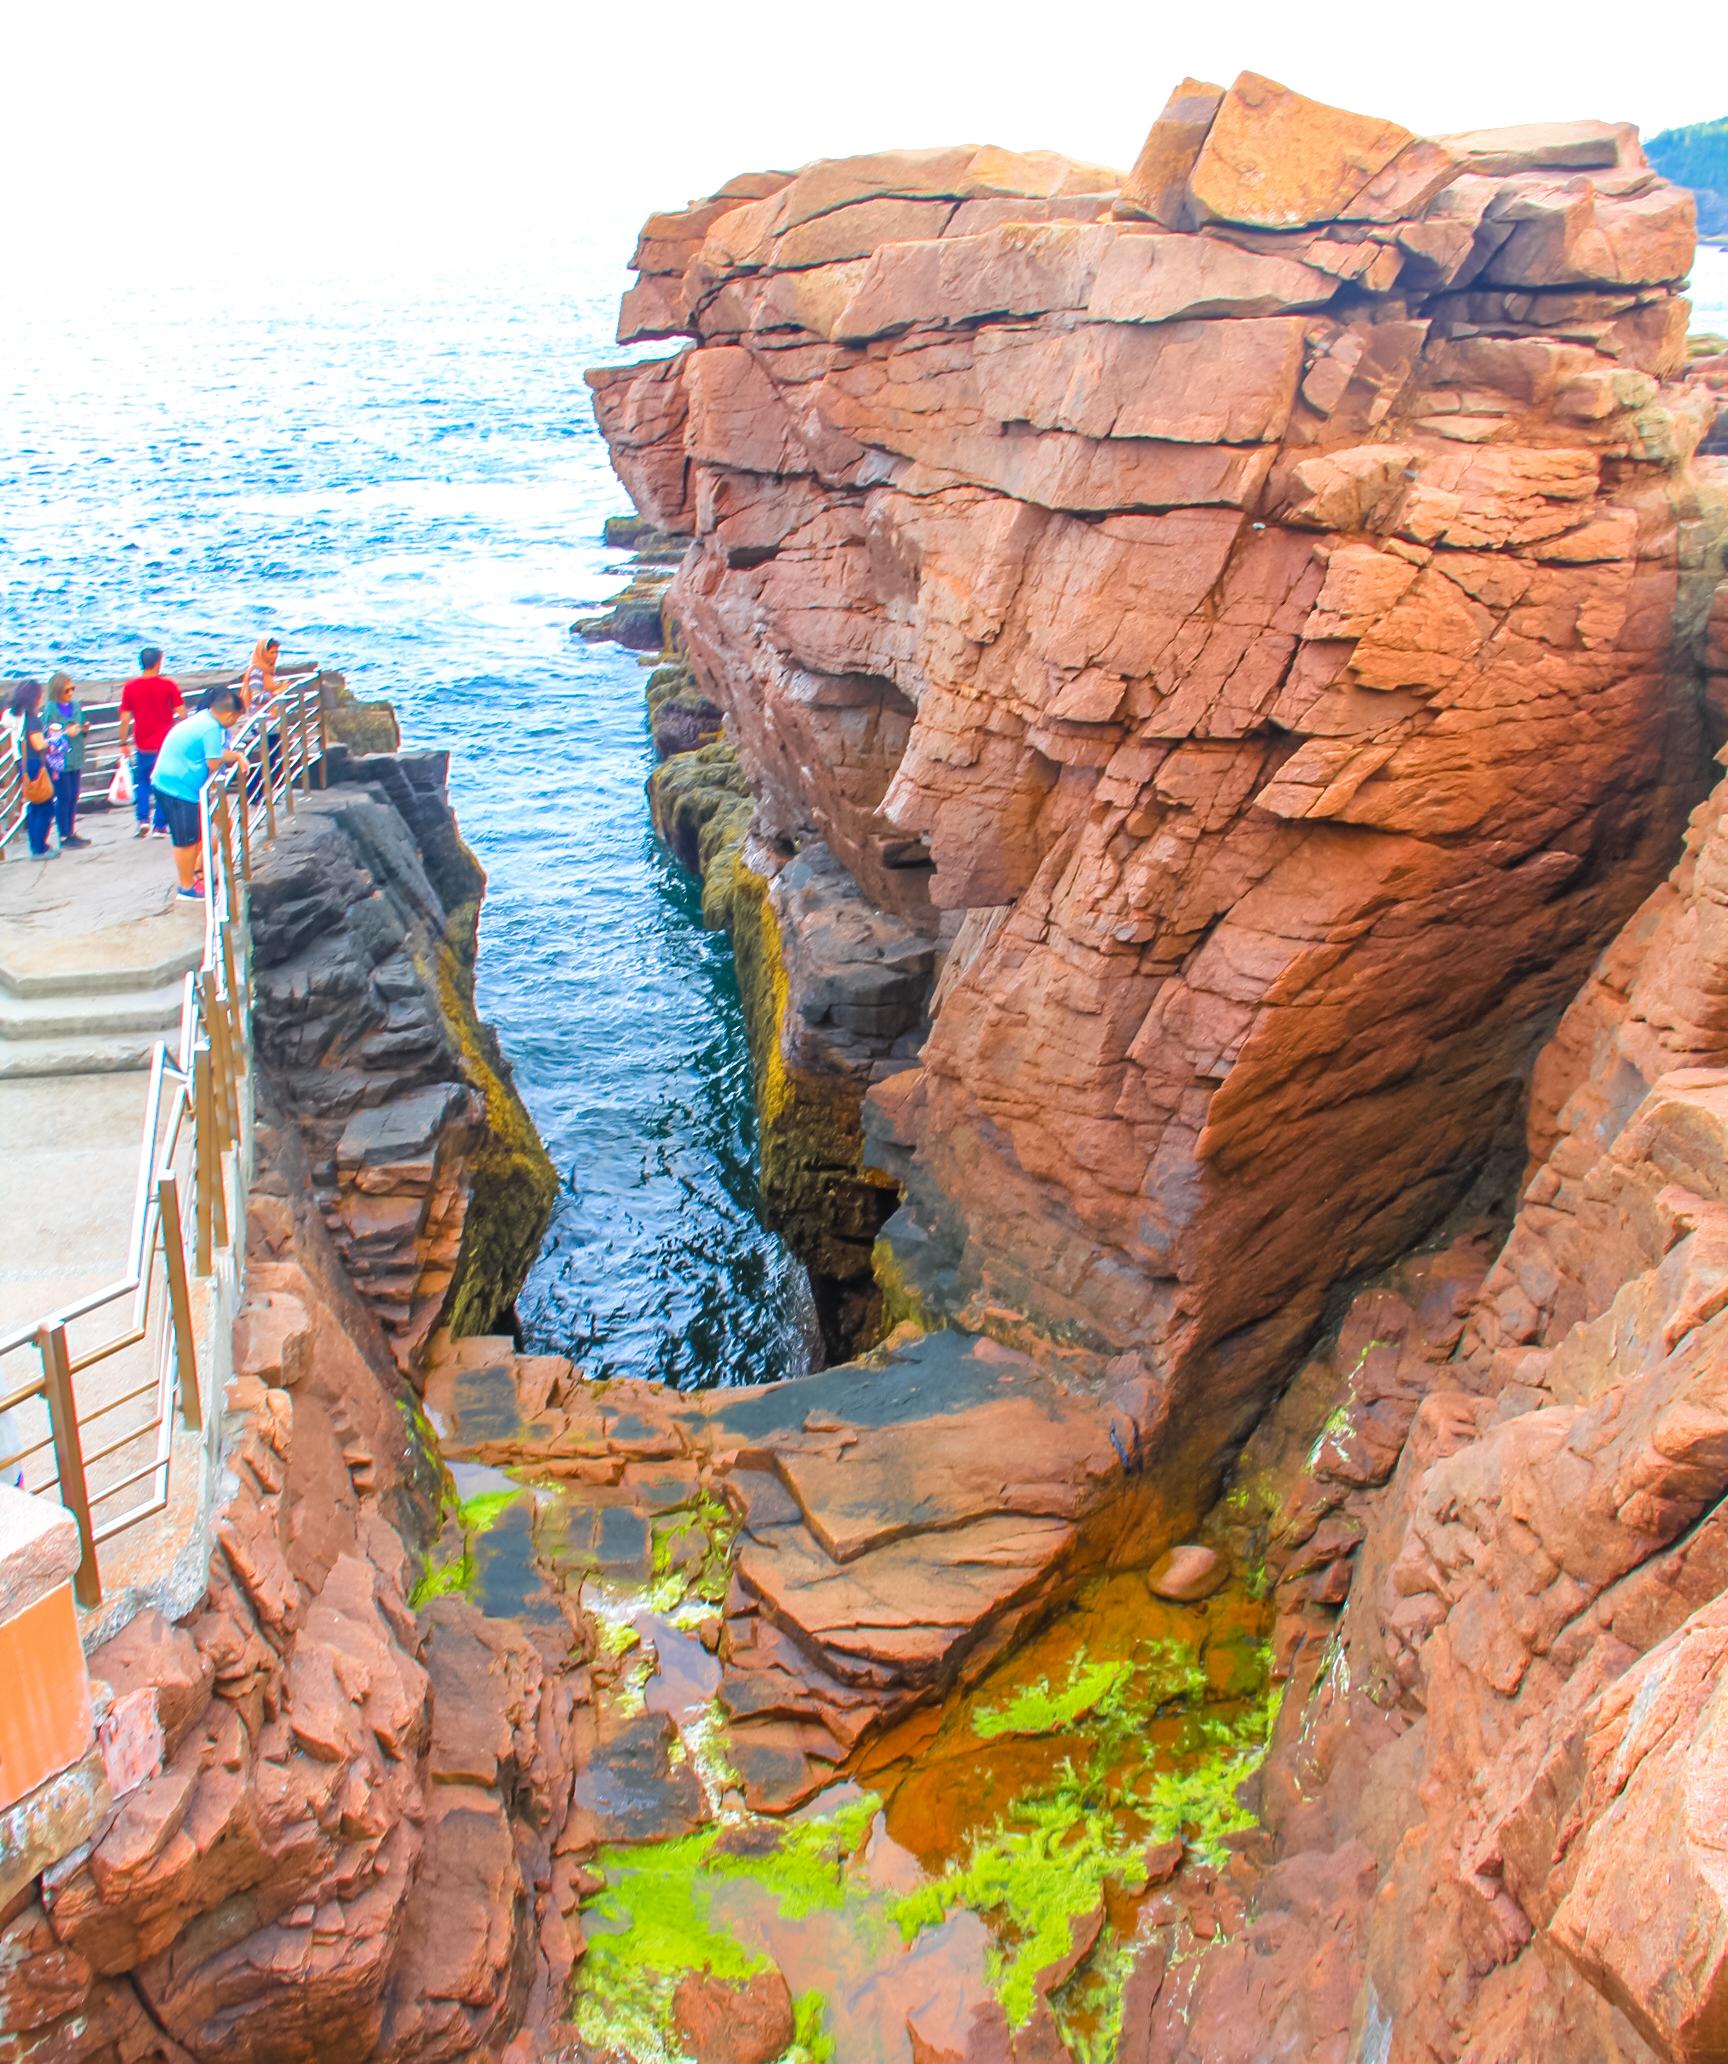 File:Thunder hole, Acadia National Park, Maine.jpg - Wikimedia Commons